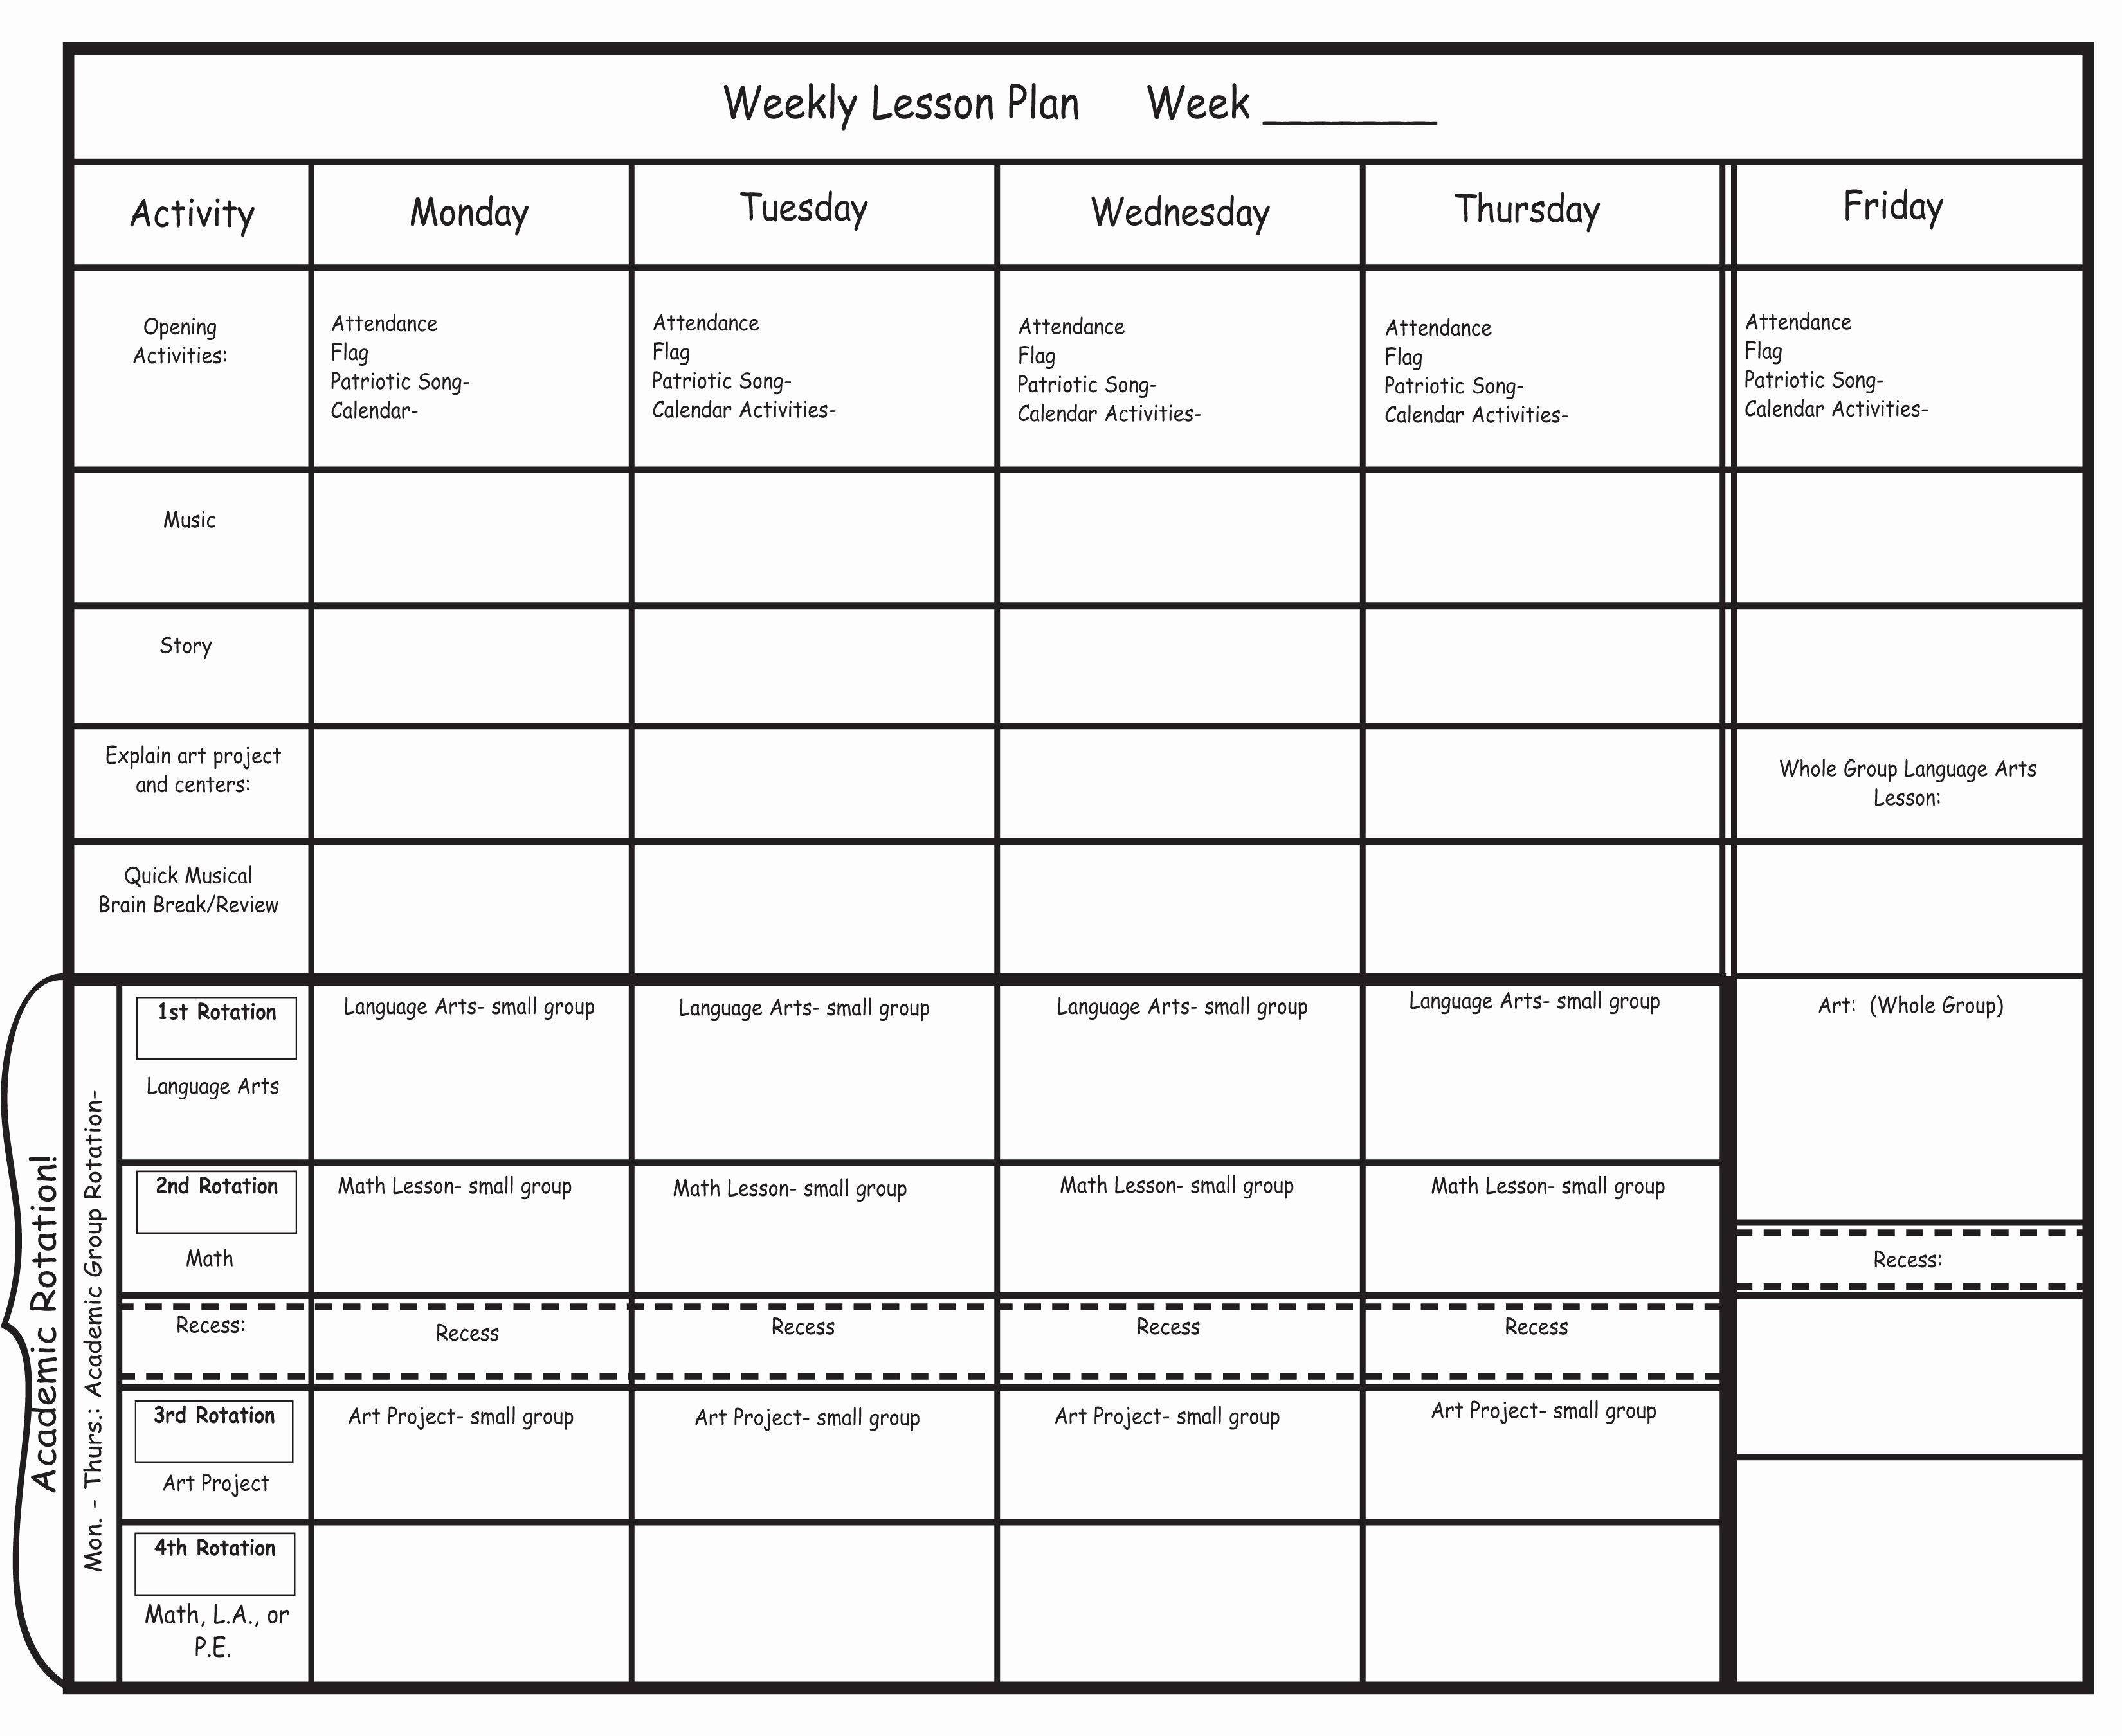 Blank Preschool Lesson Plan Template New Preschool Lesson Plan Template Blank Prelesson Best